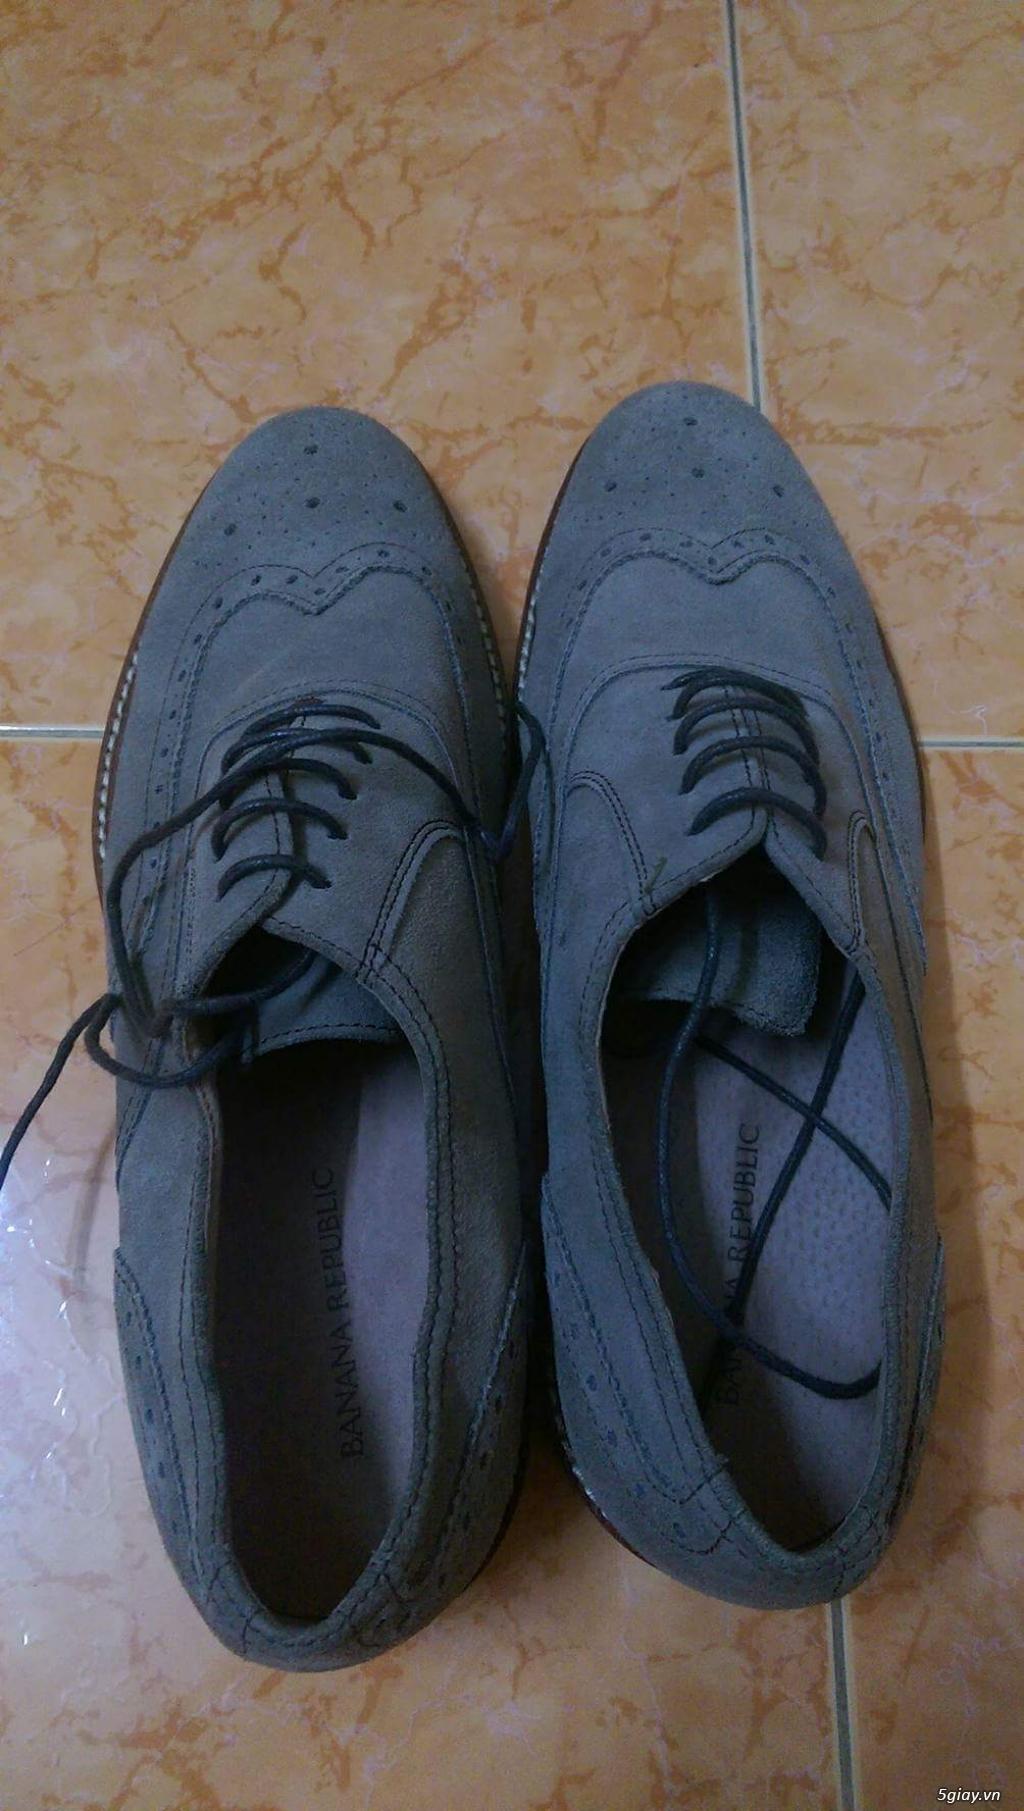 Giày da lộn Mango 100% size 41 + Brogue Banana Republic 99% size 43 - 5